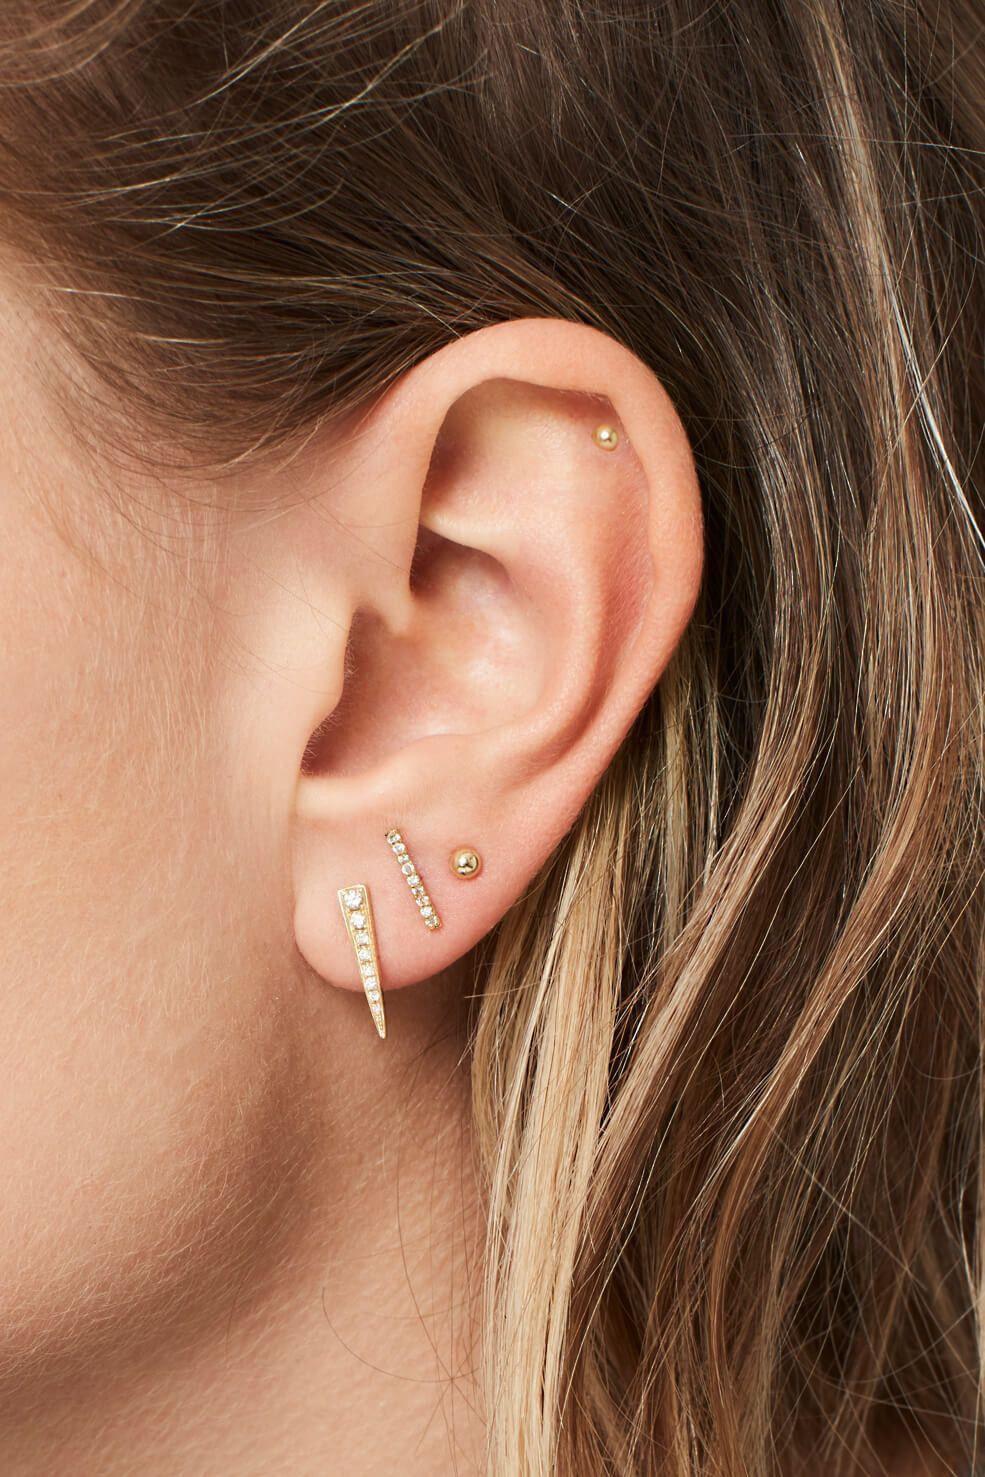 Piercing nose with earring  SMALL GOLD STUD EARRING  Object  Want  Pinterest  Earrings